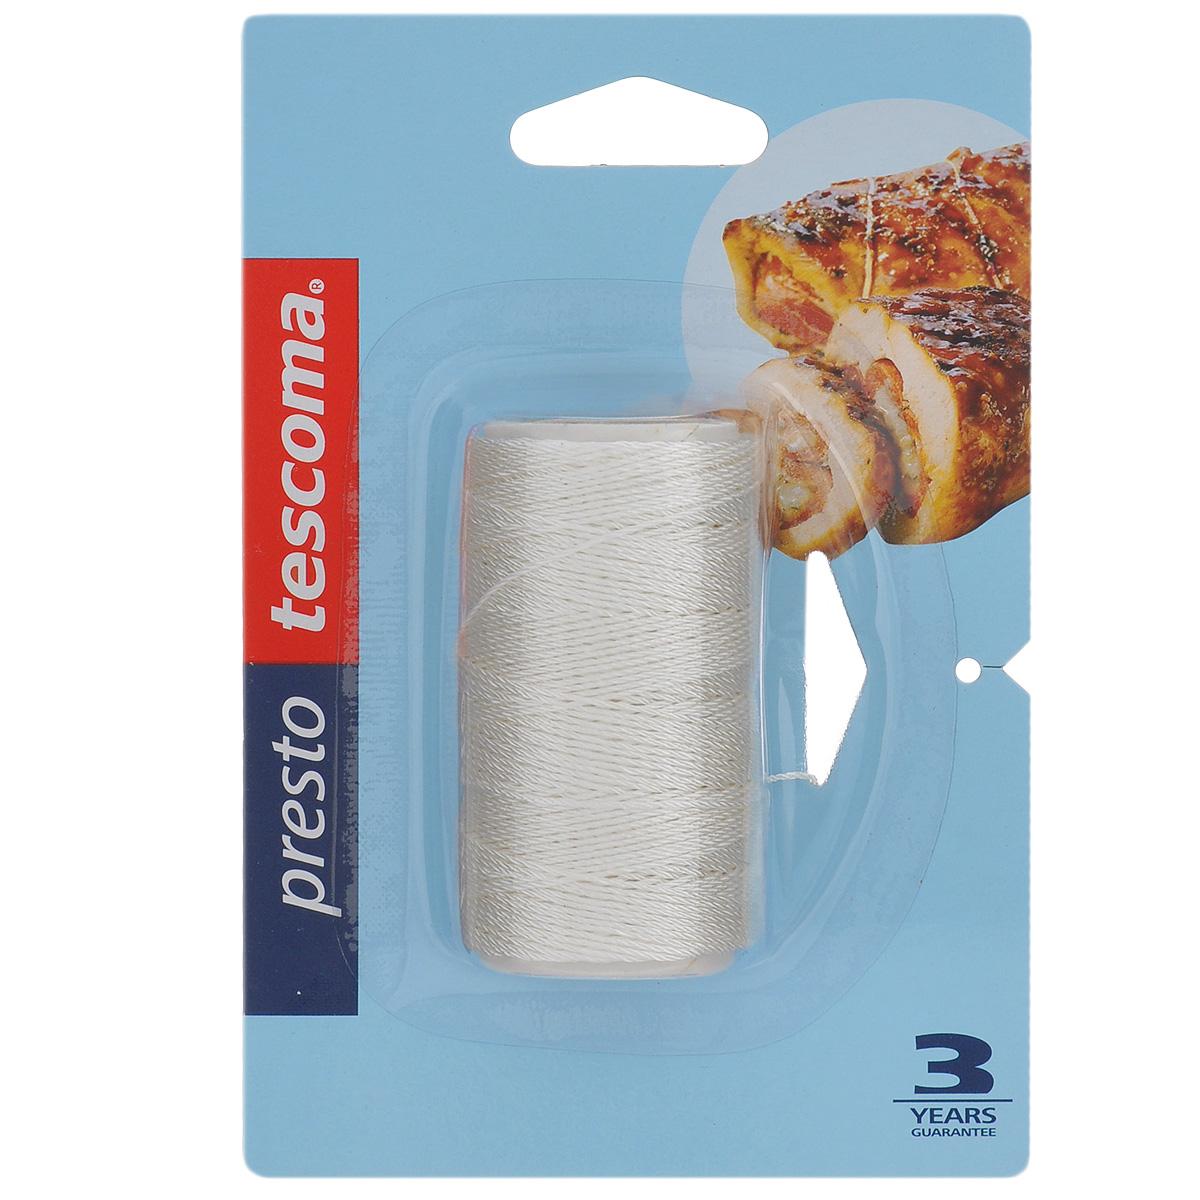 Веревка для выпечки Tescoma